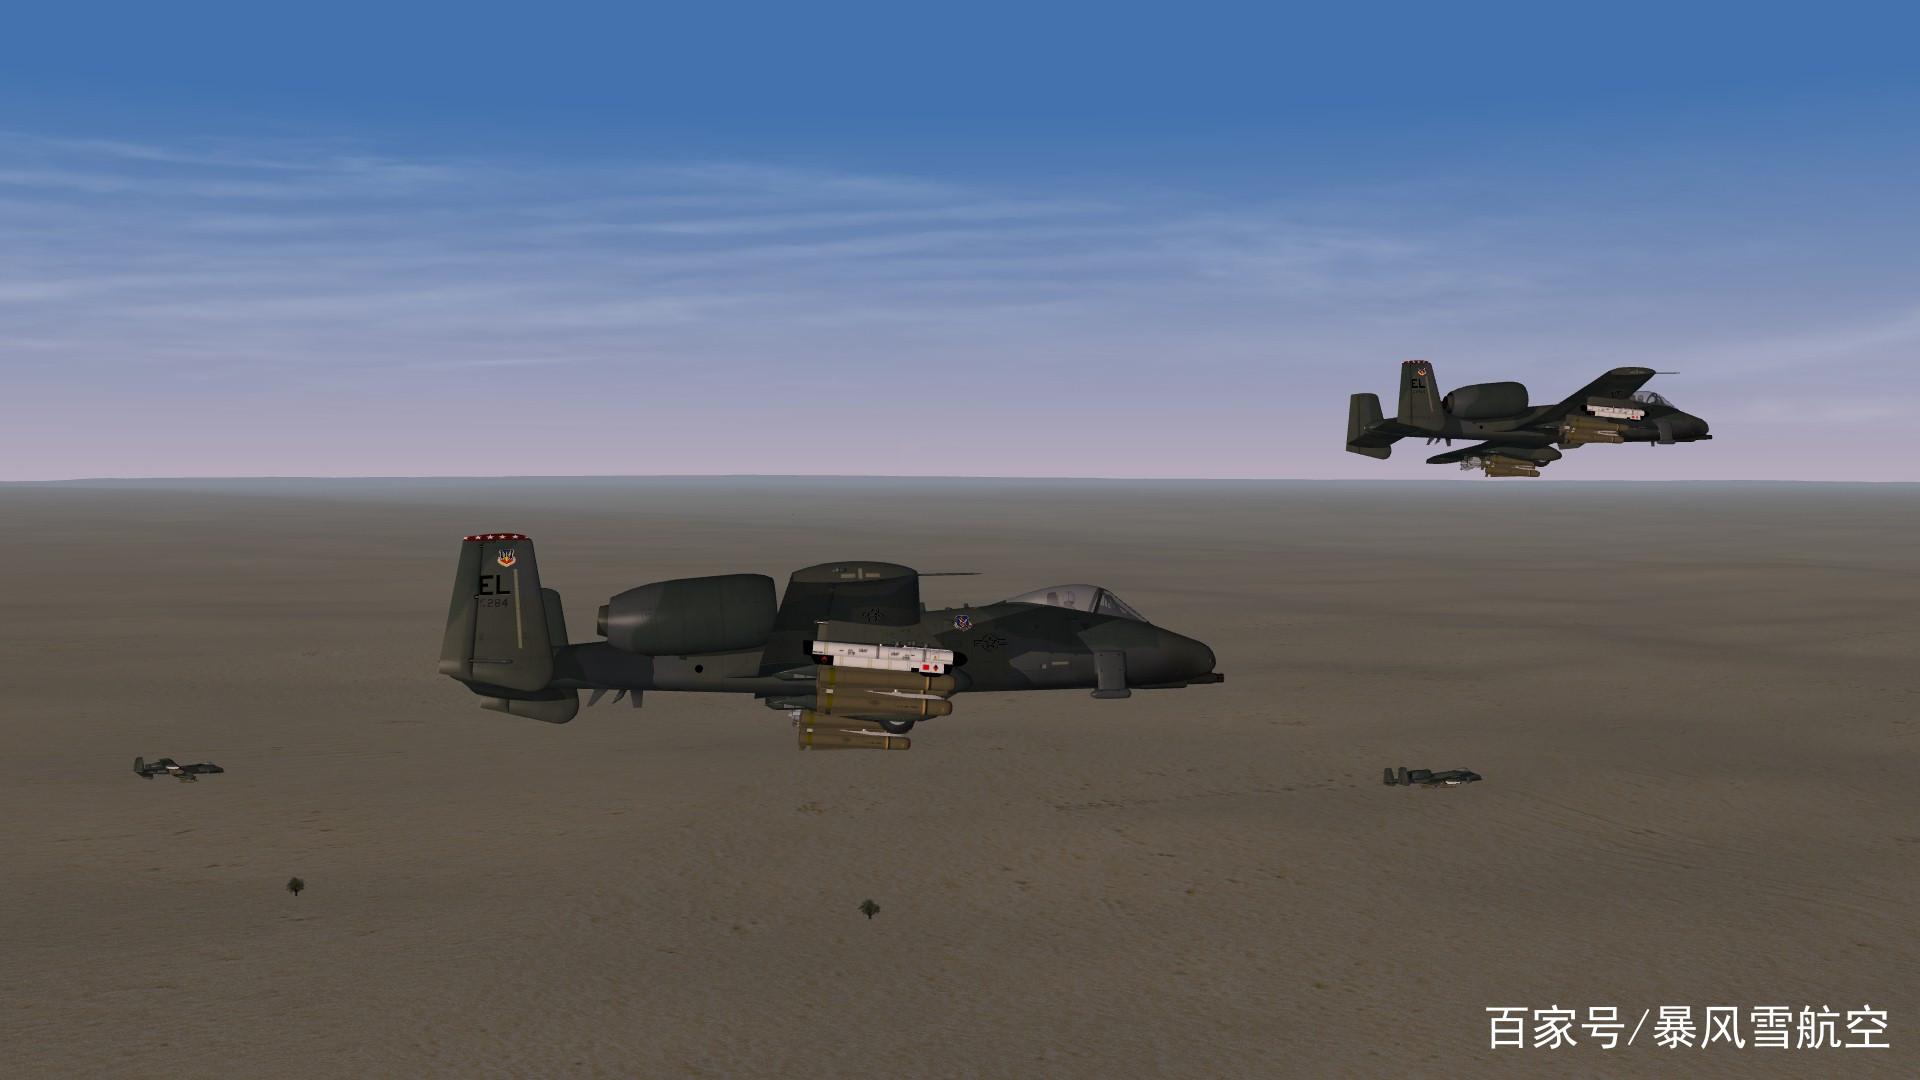 99A都要避其锋芒,A10攻击机缘何让坦克胆寒